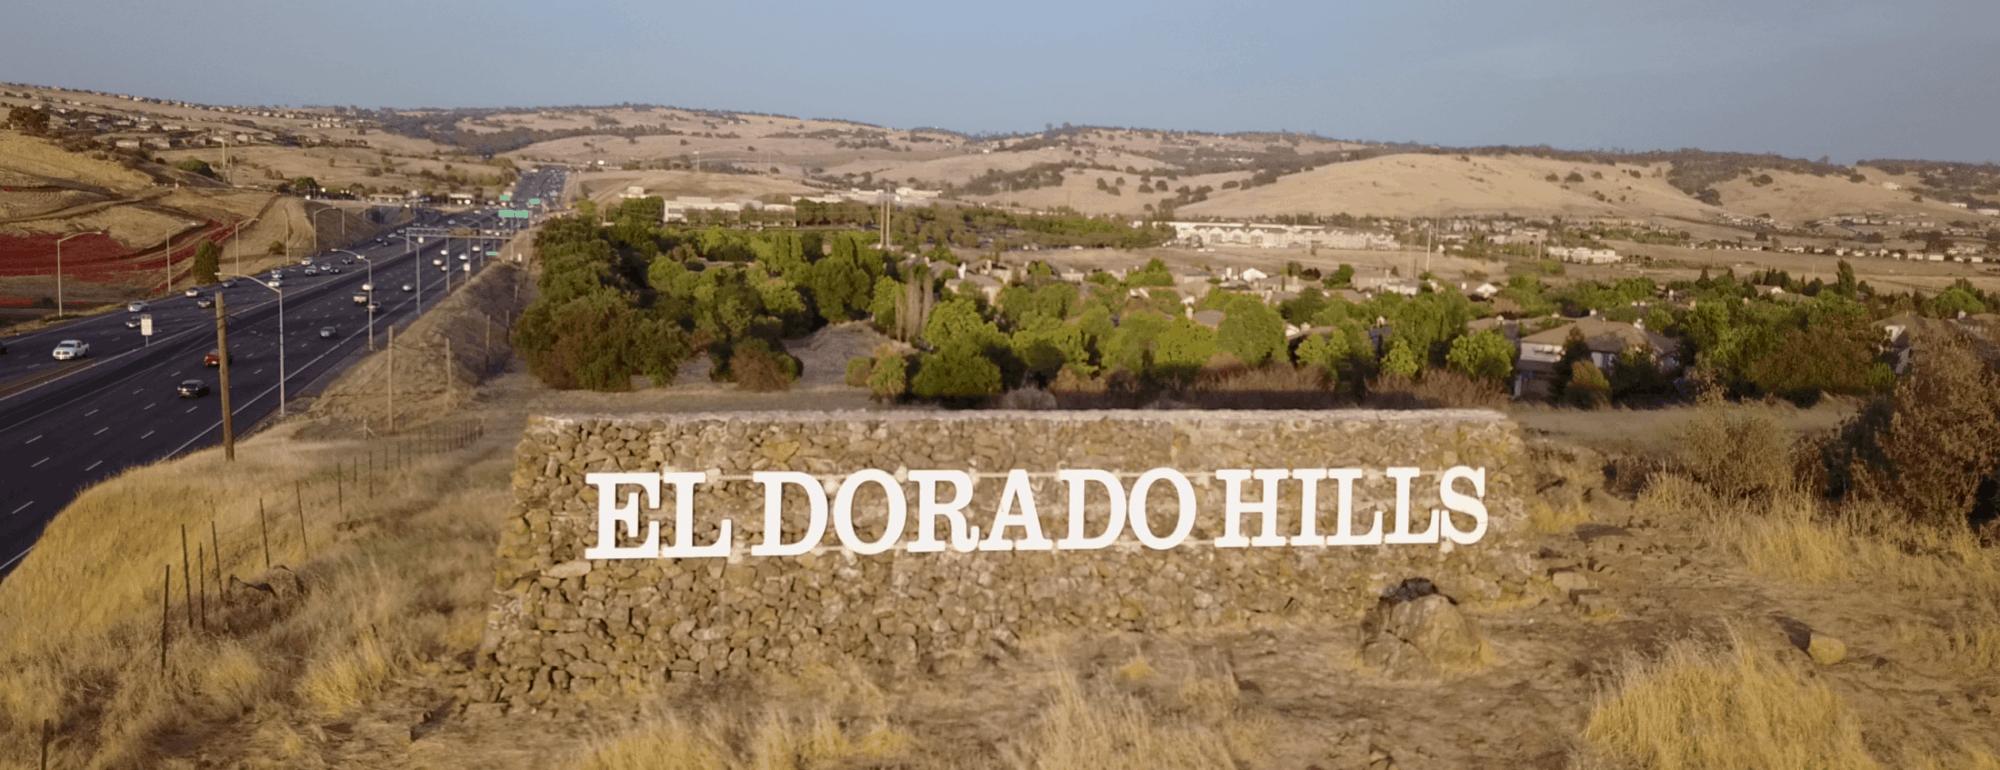 El Dorado Hills SEO